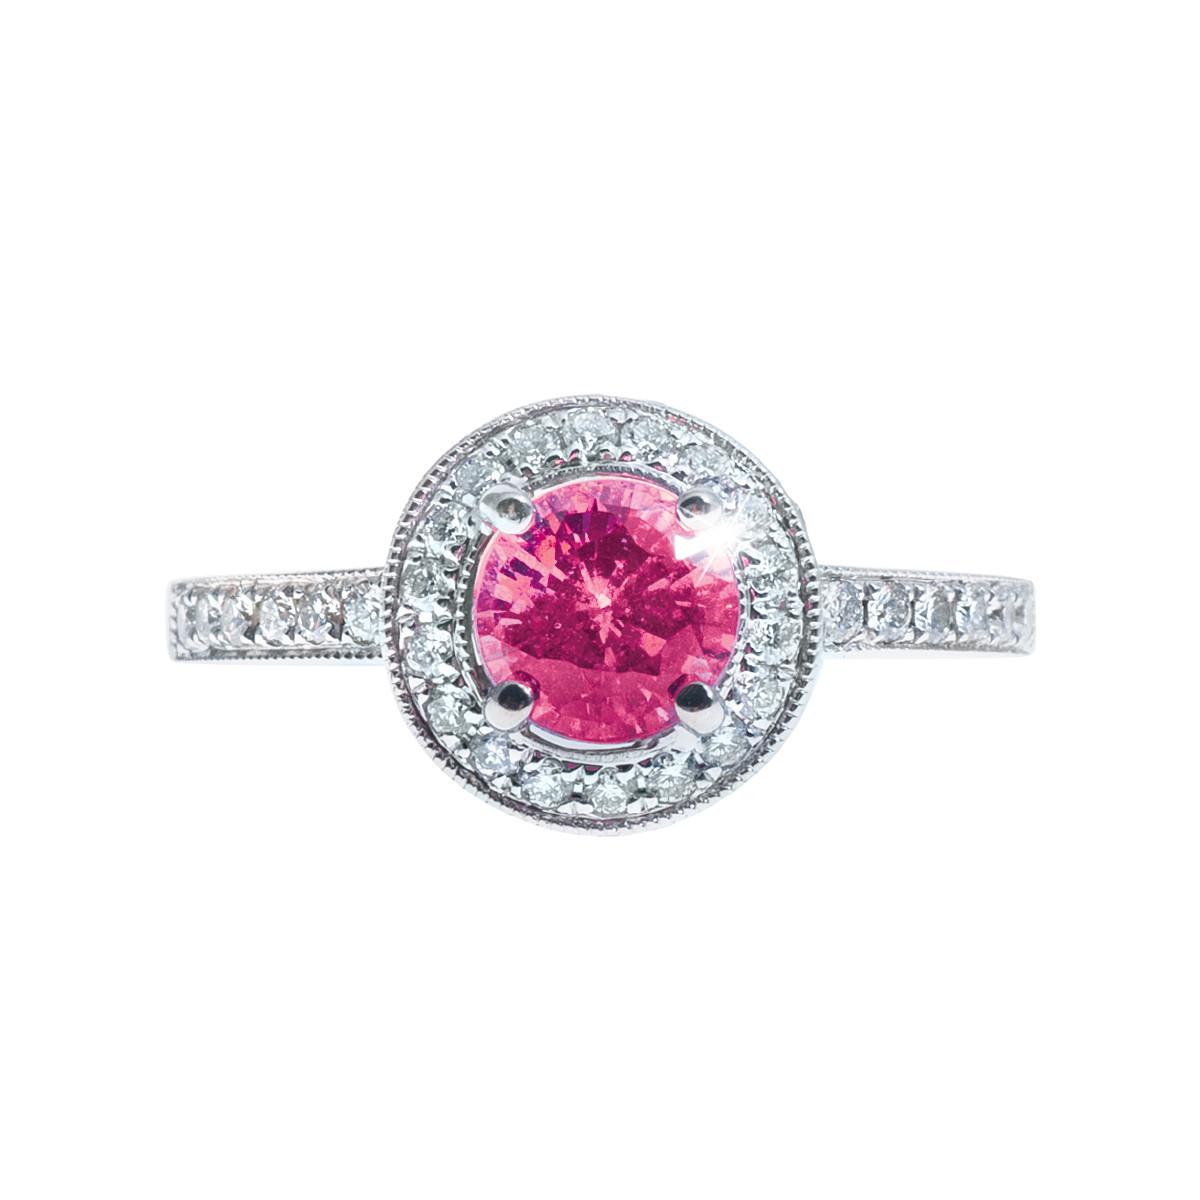 Vintage 1.84 CTW Pink Sapphire & Diamond Ring